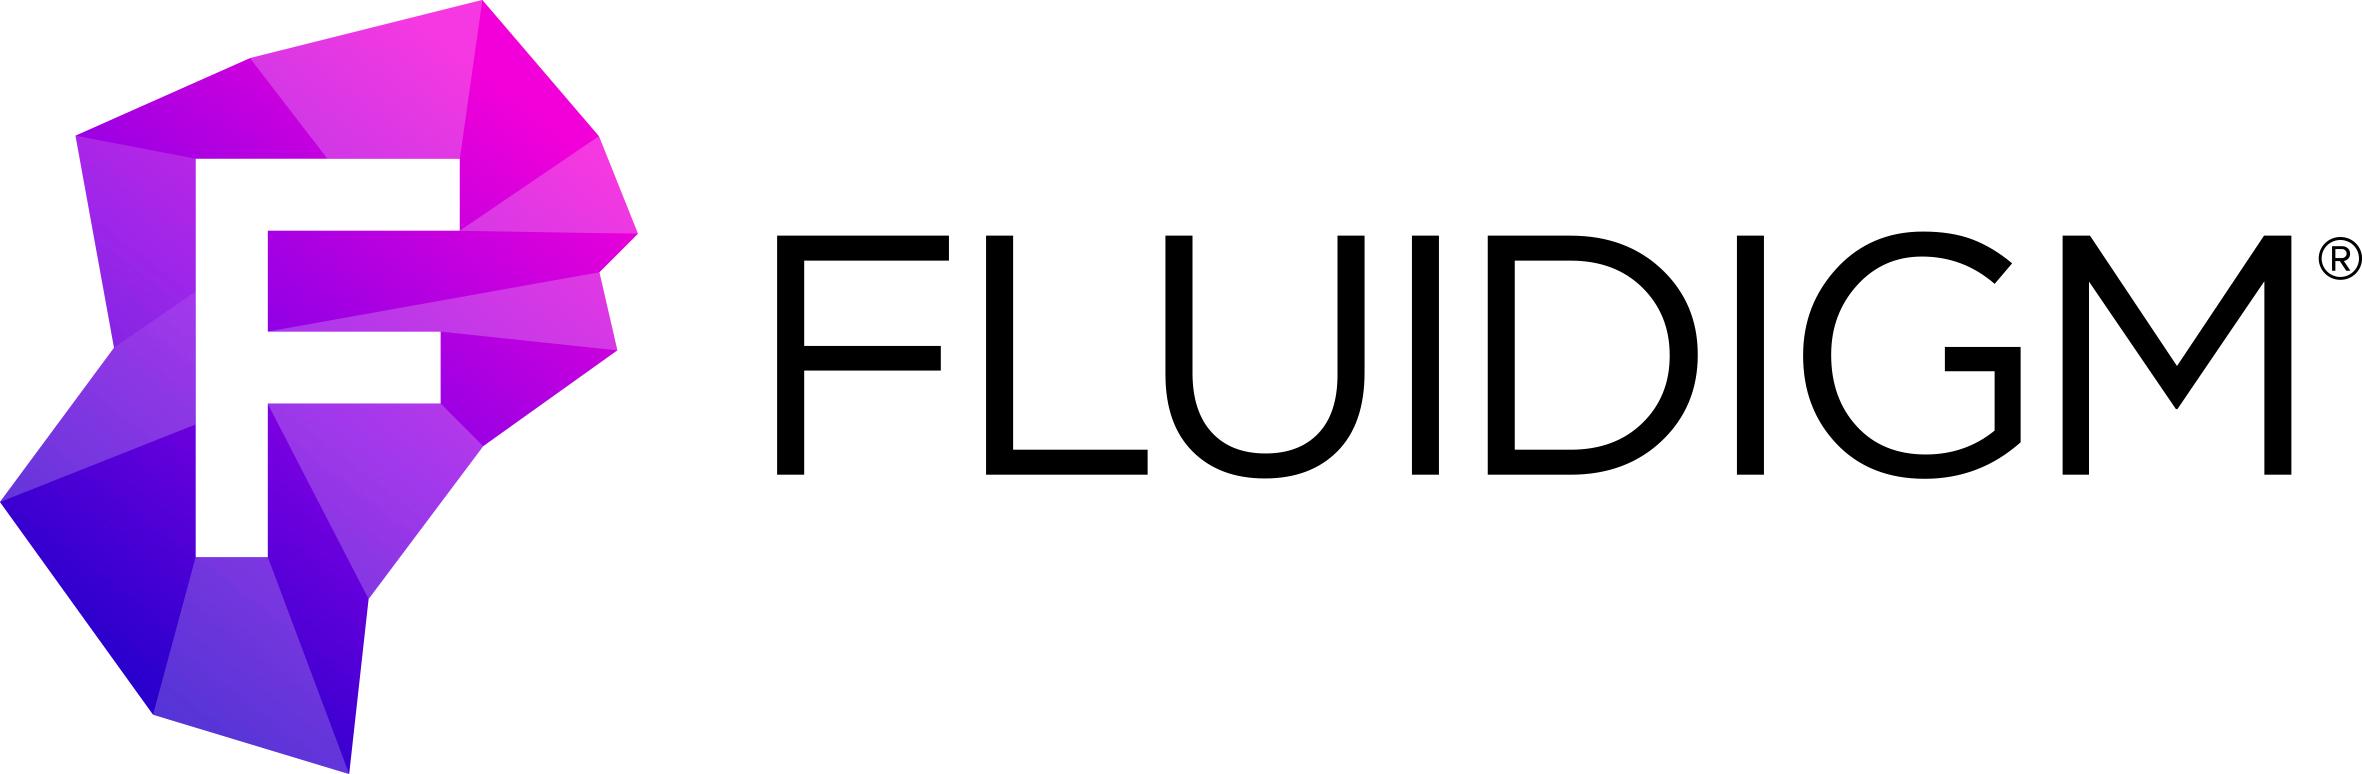 Fluidigmfluid_logo_pink_black_CMYK